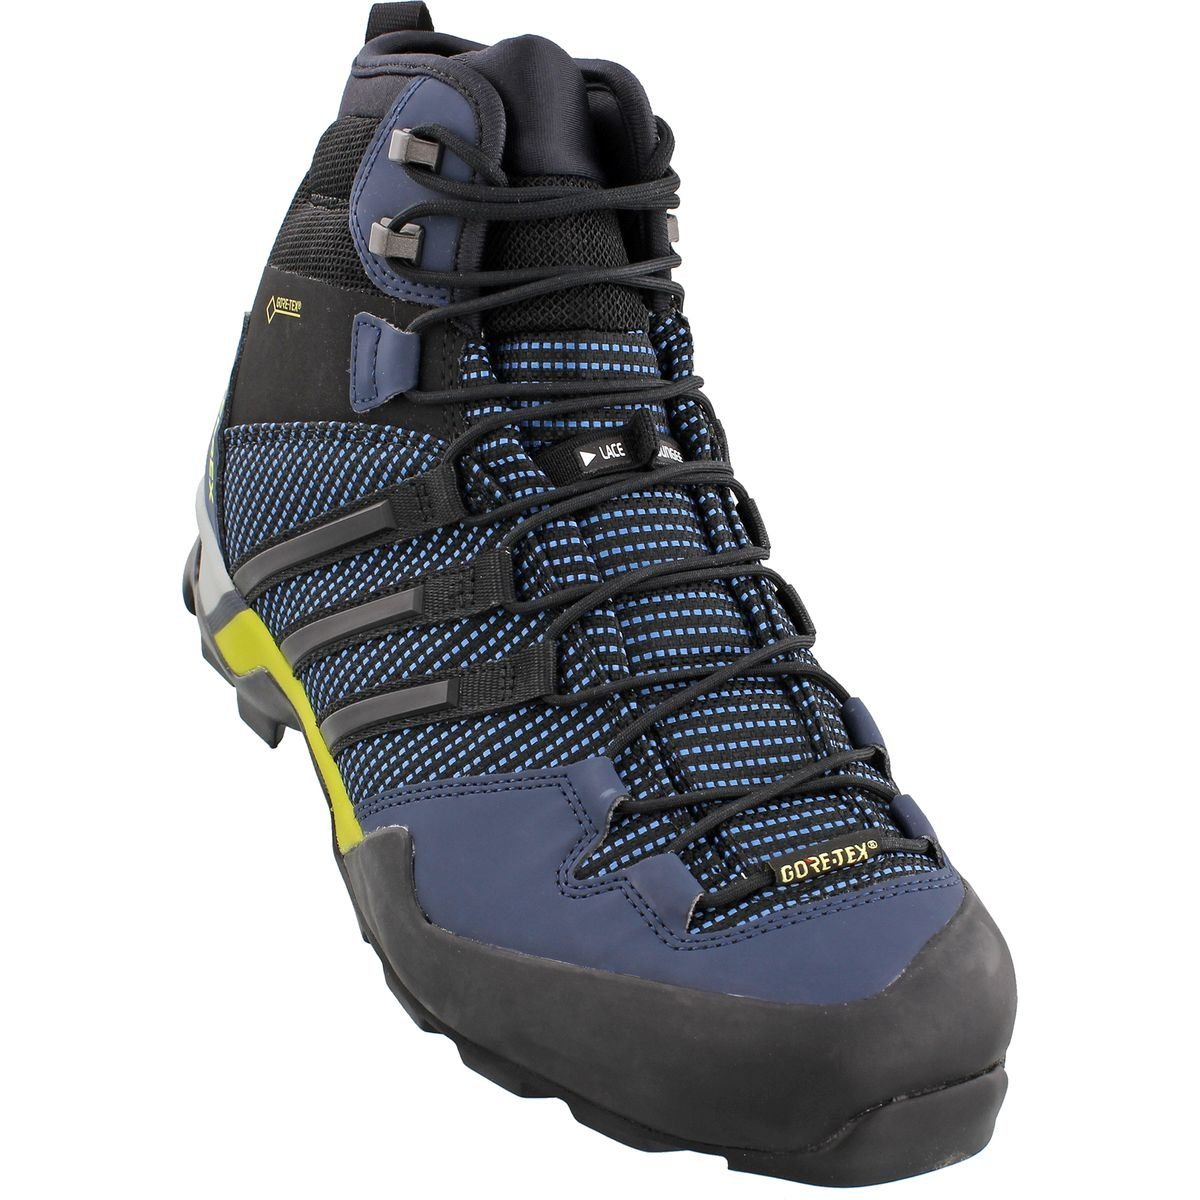 9dc99aa9e Galleon - Adidas Outdoor Mens Terrex Scope High GTX Shoe (13 - Core Blue  Black Col. Navy)